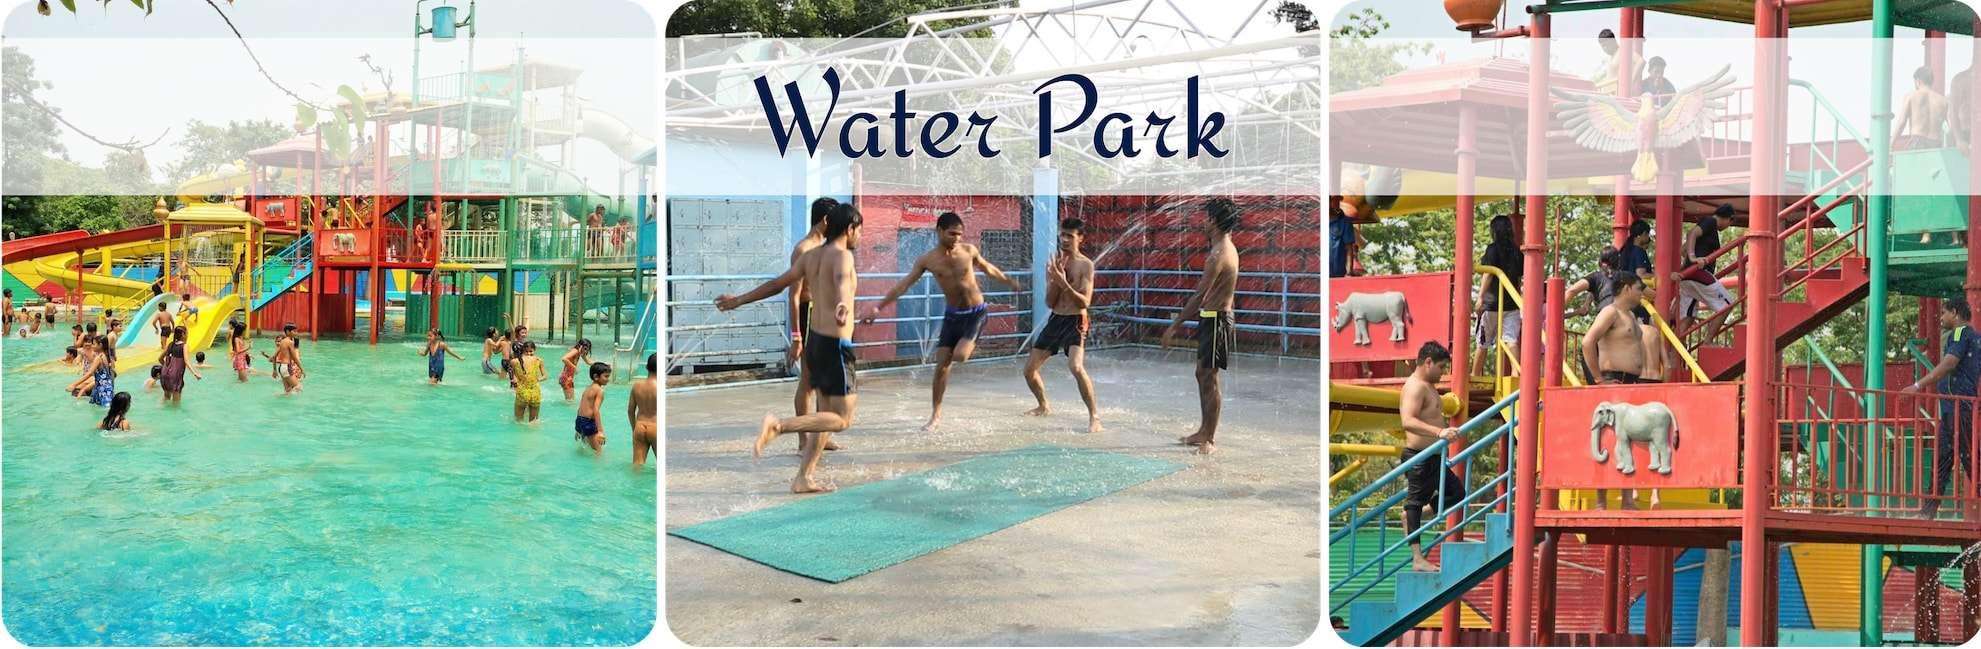 Water-park-delhi-rides.